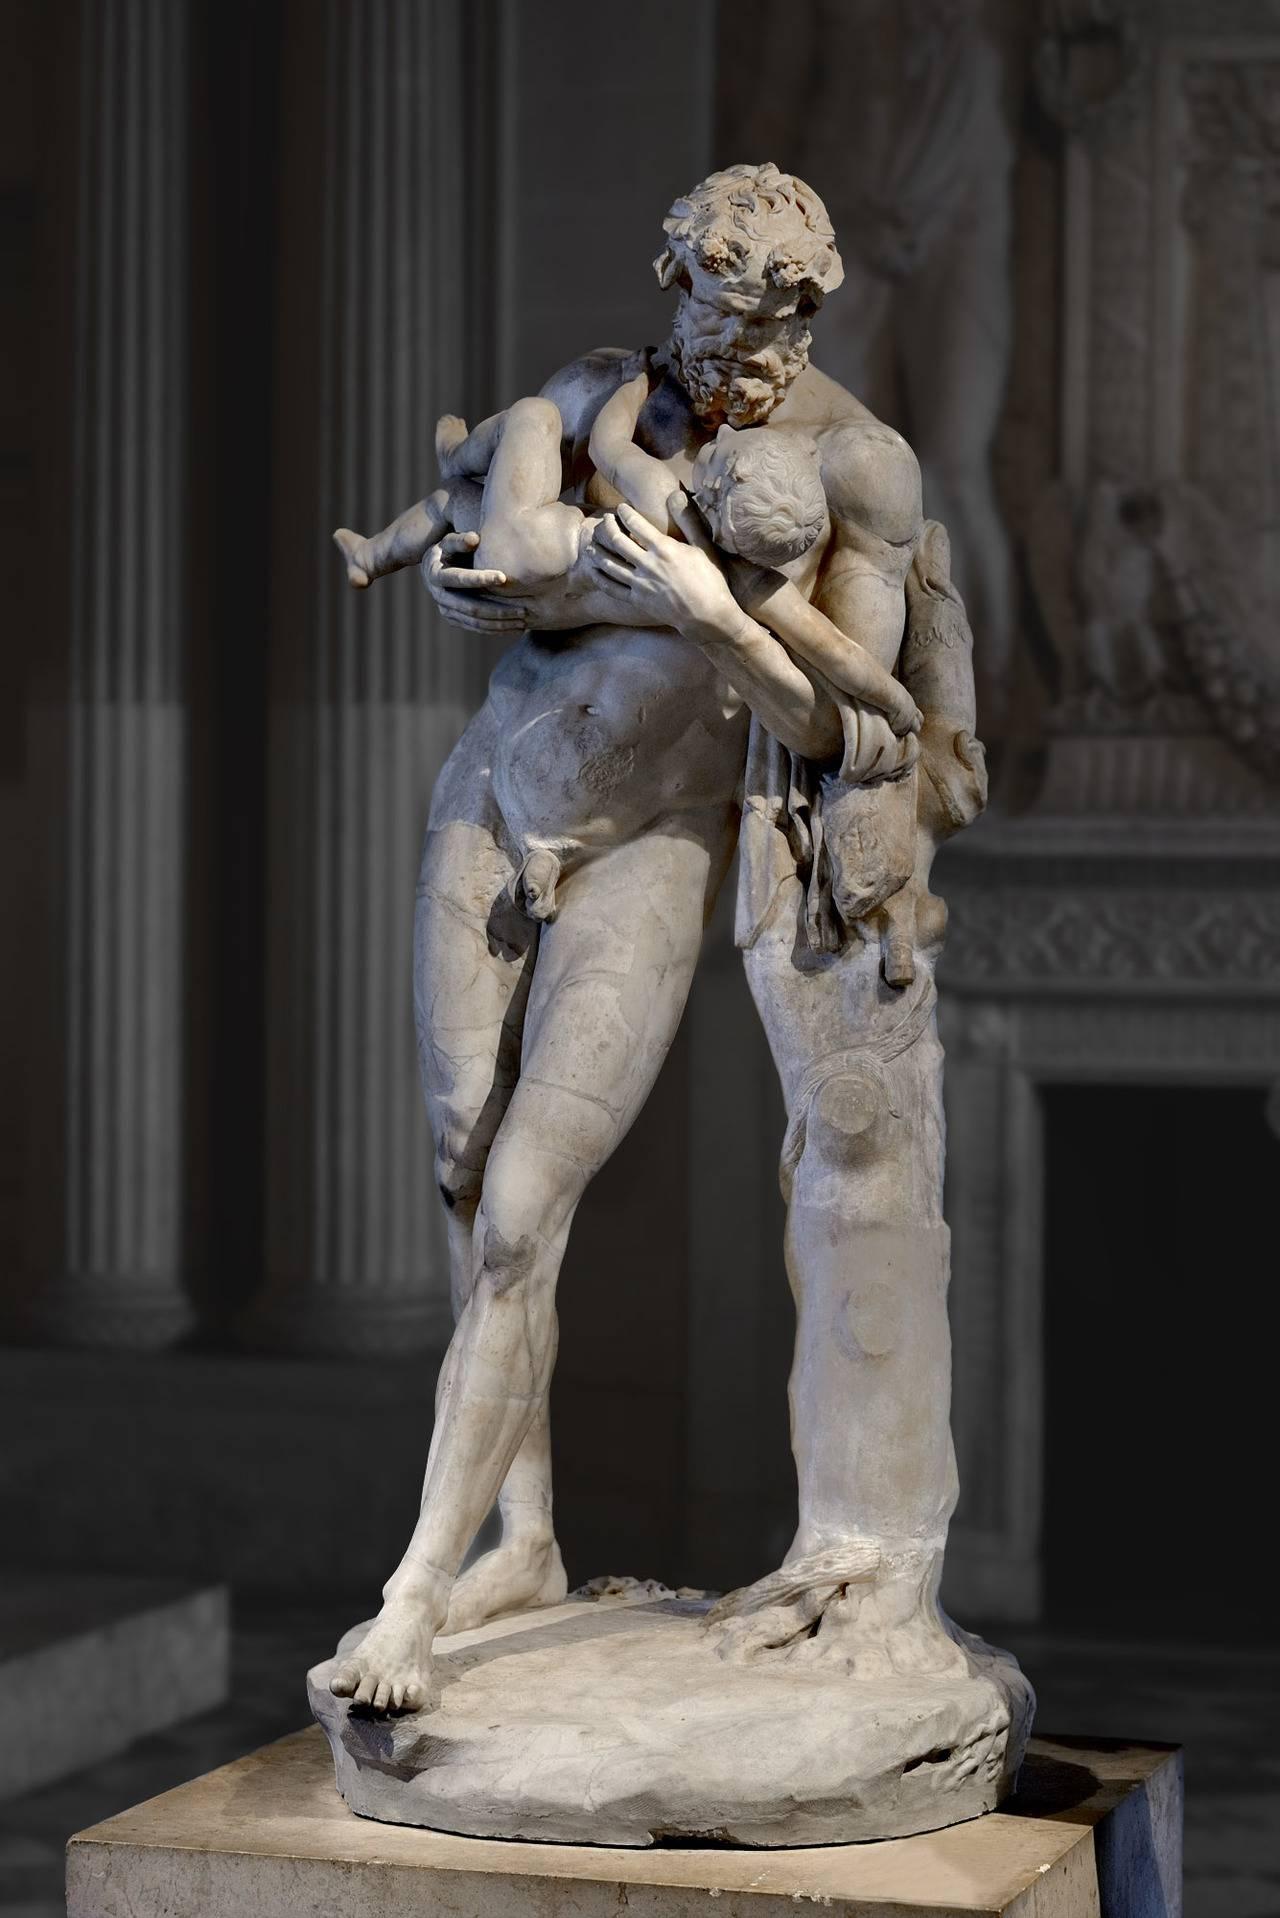 Silenus cradling the infant Dionysus